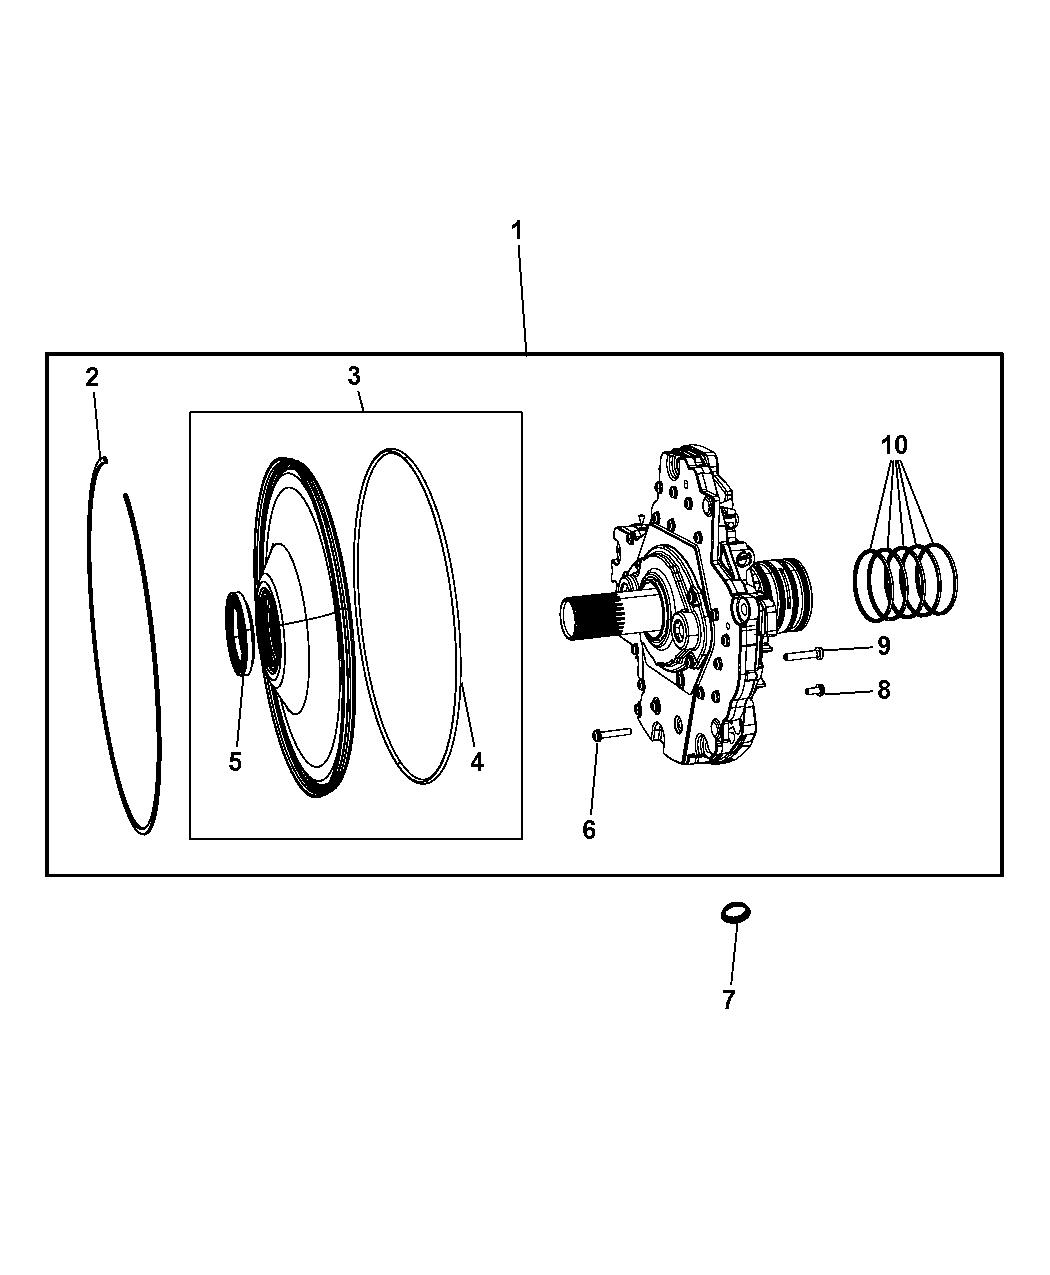 ford aod aode difference aod pump diagram: genuine mopar pump kit- transmission